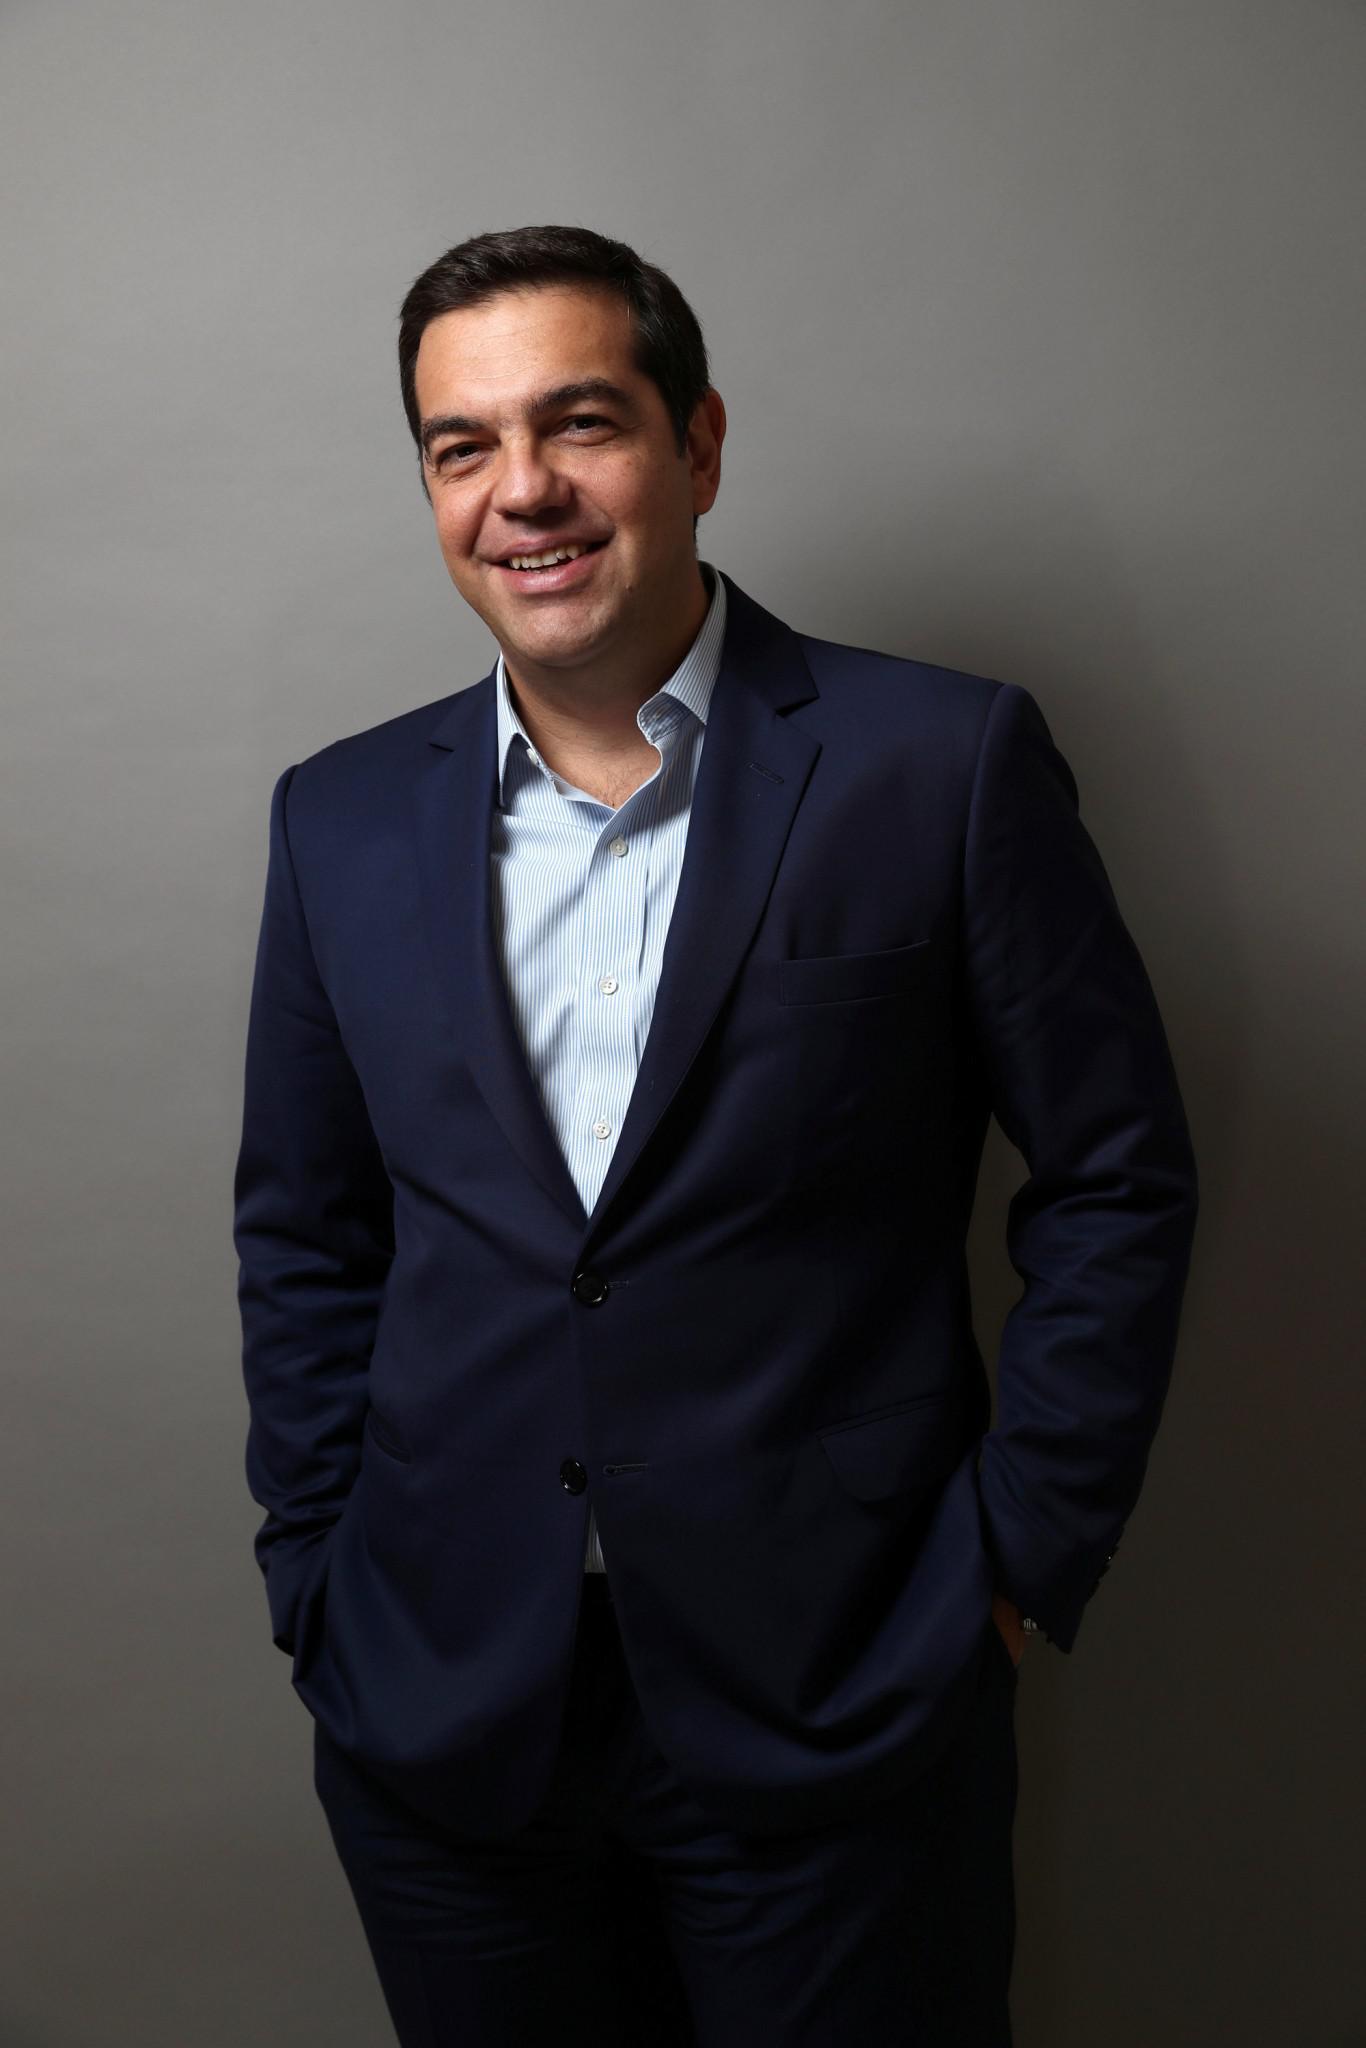 tsipras-reuters3-1300